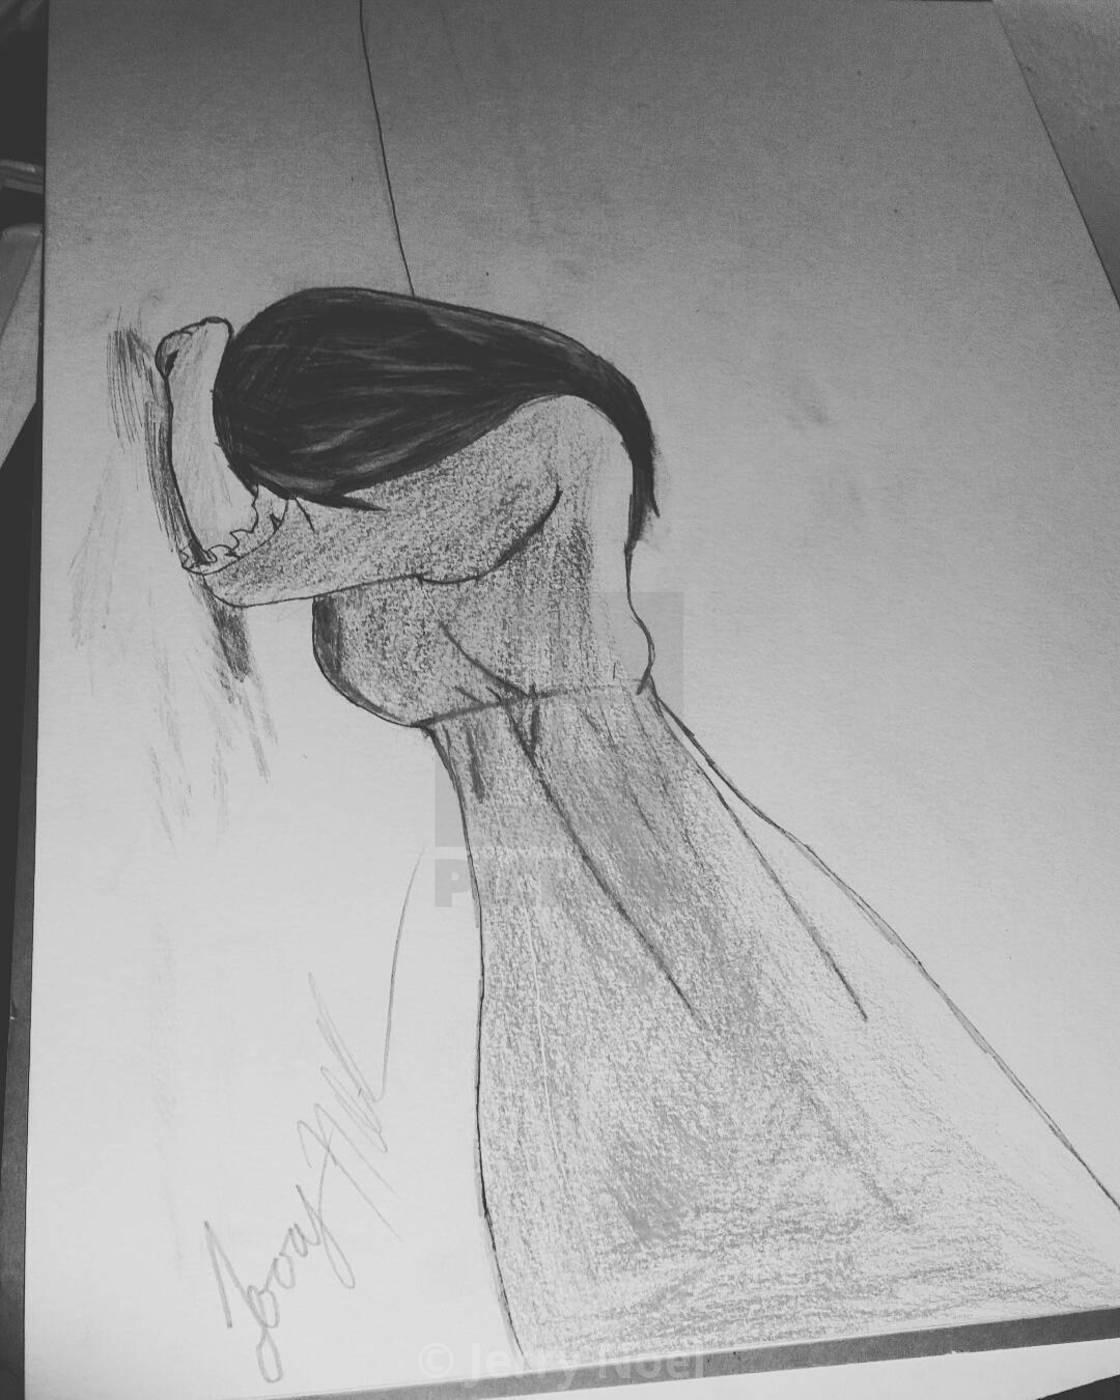 Drawing Of A Girl Crying : drawing, crying, Drawing, Crying, License,, Download, Print, £12.40, Photos, Picfair